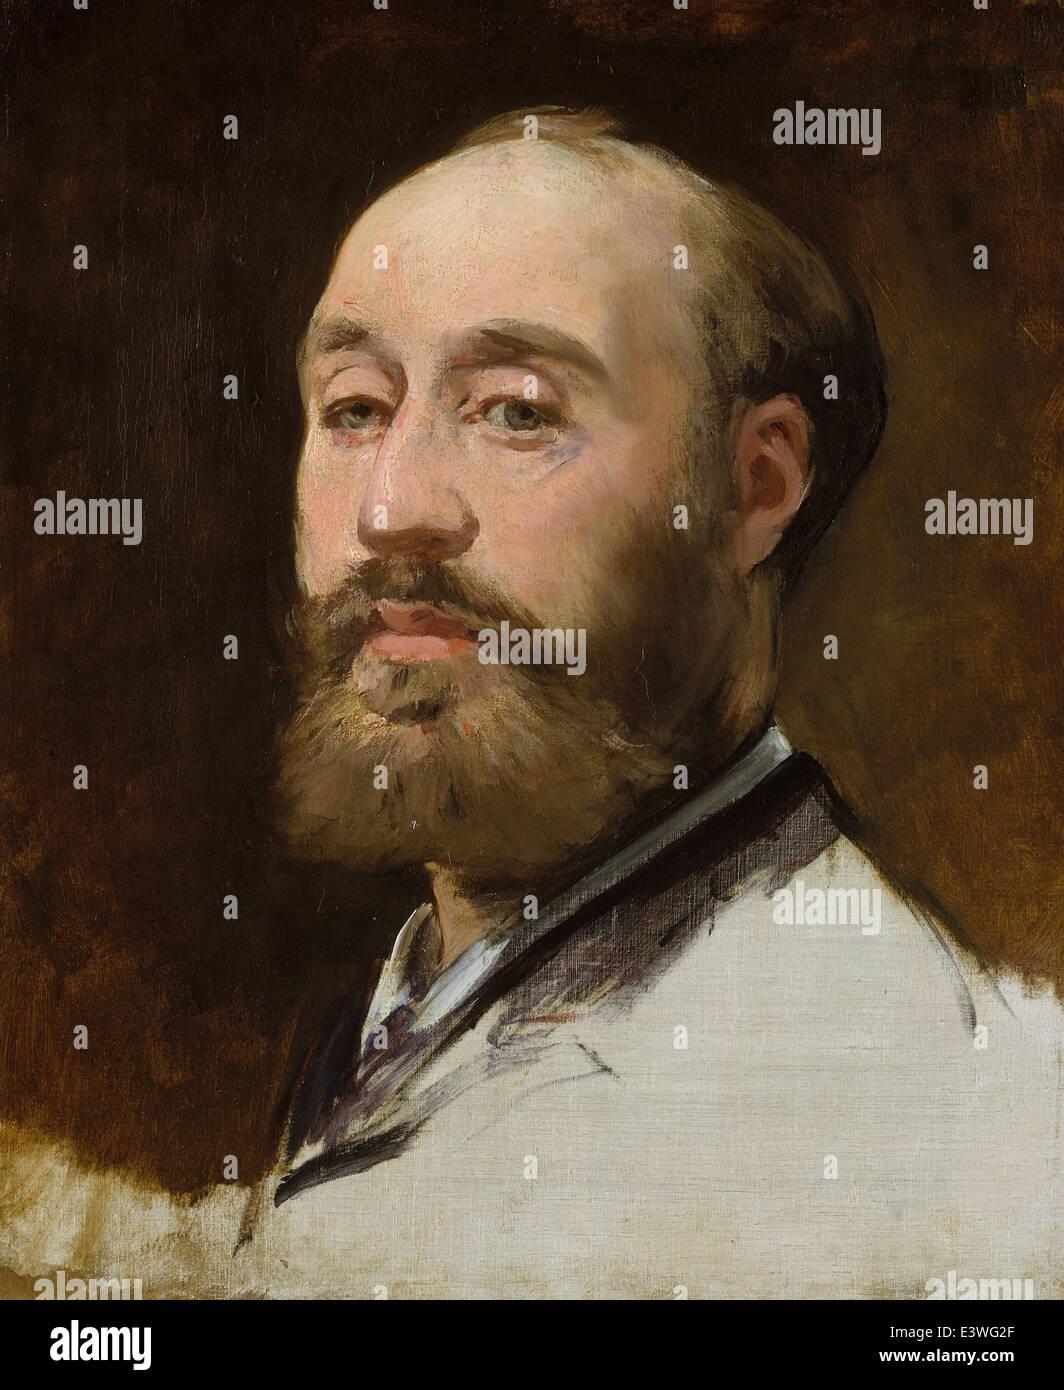 Édouard Manet - Head of Jean-Baptiste Faure - 1883 - MET Museum - New-York - Stock Image